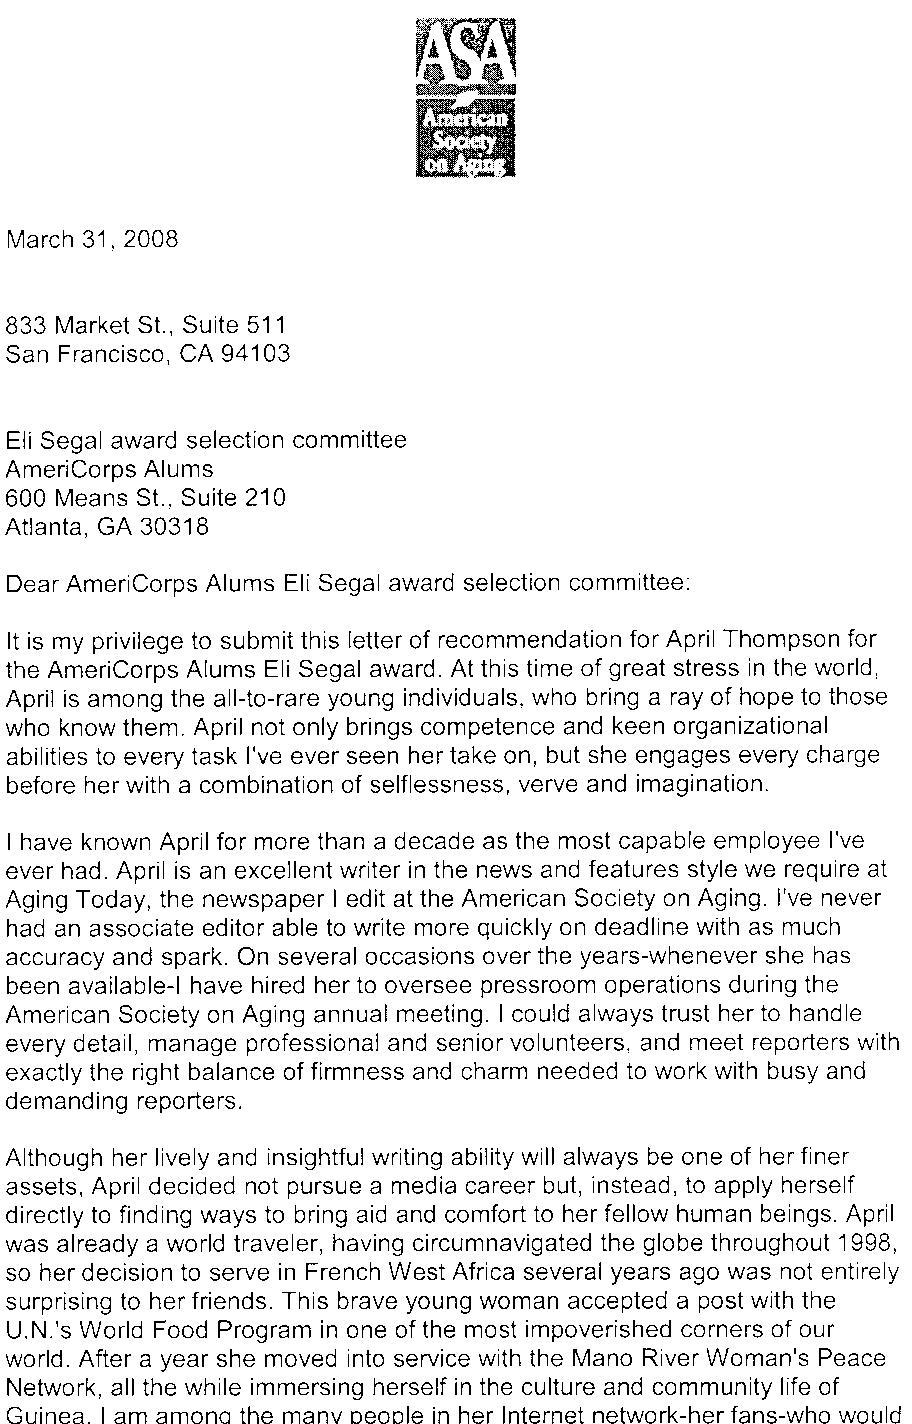 eli segal award finalists americorps alums letter of endorsement part 1